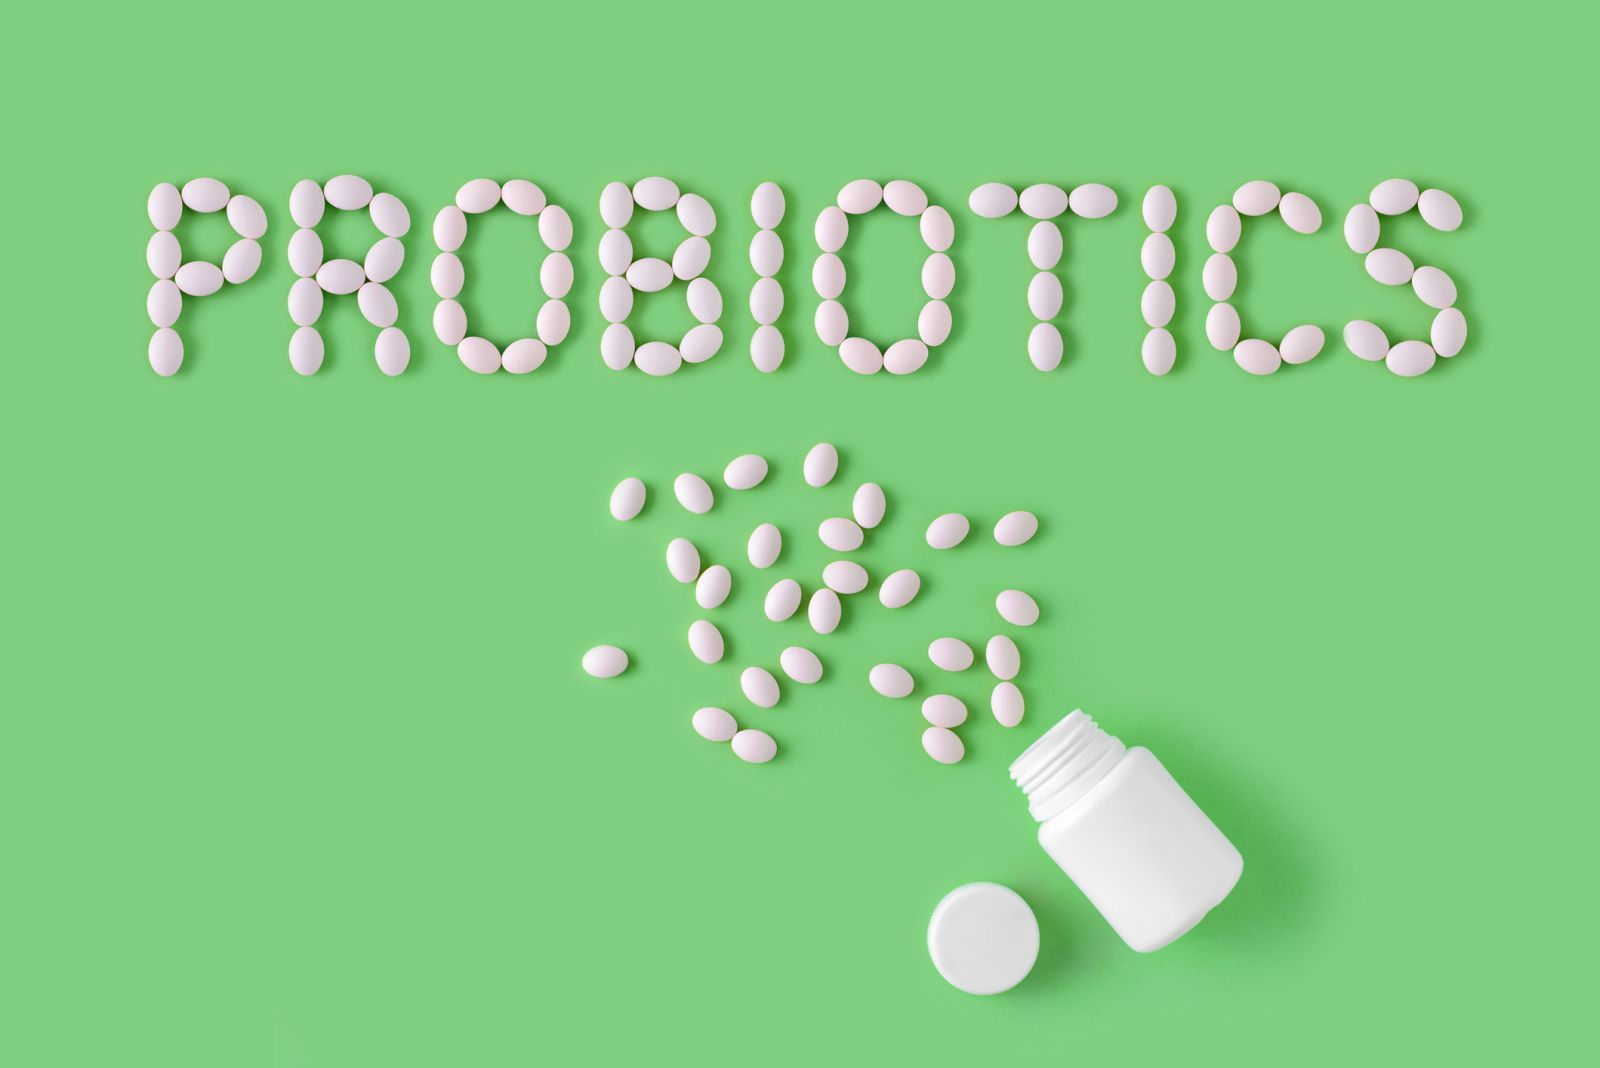 پروبیوتیک یک ضد سرفه طبیعی